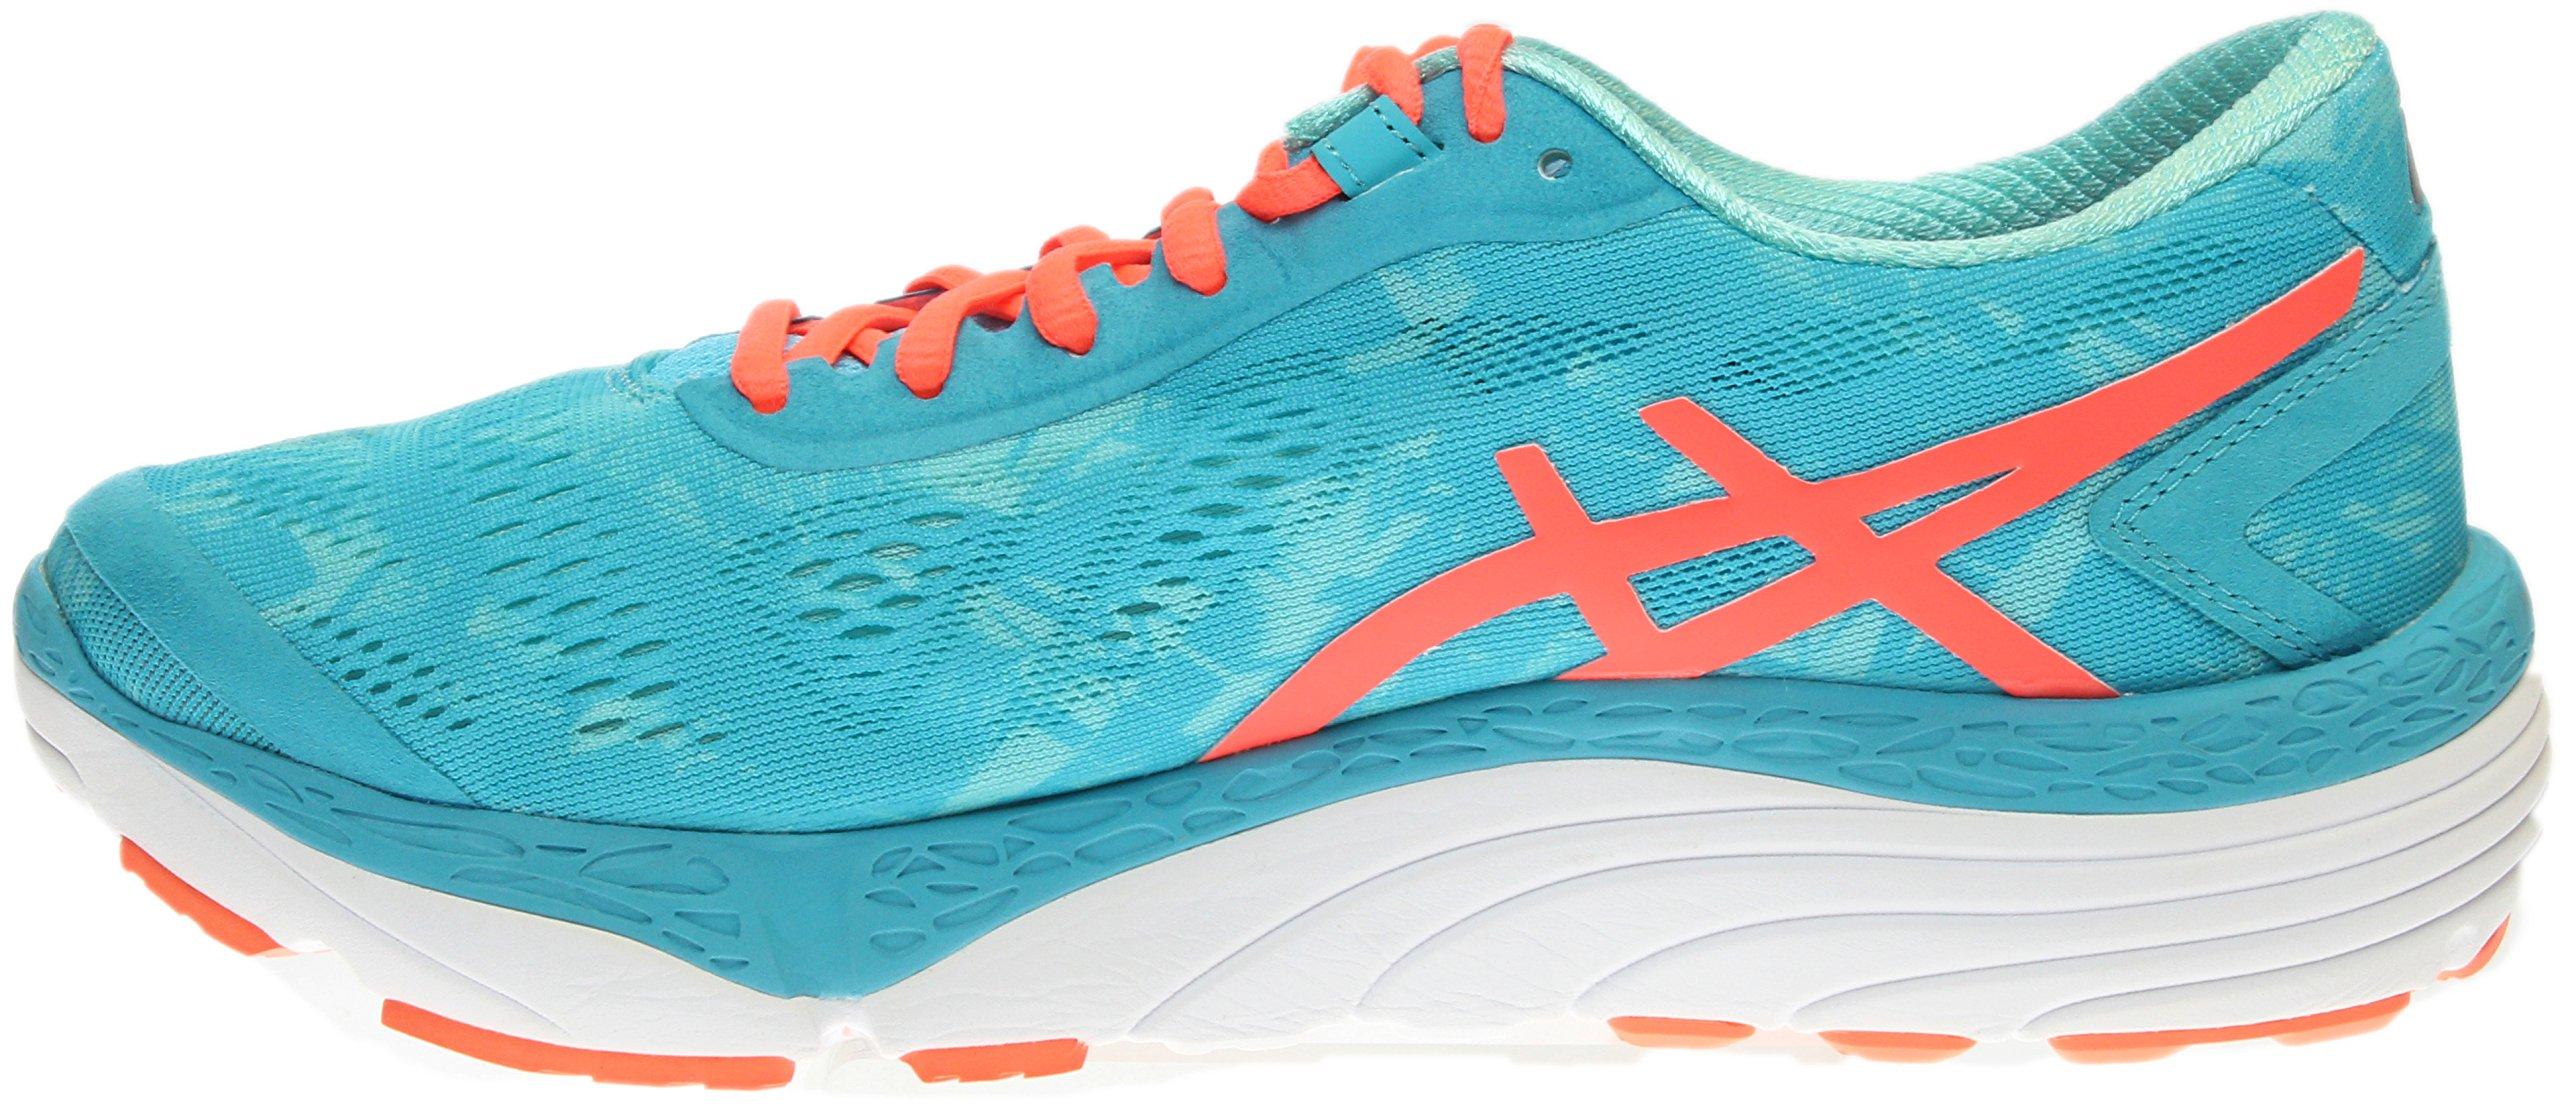 ASICS Women's 33-M 2 Running Shoe, Aquarium/Flash Coral/Aruba Blue, 9.5 M US by ASICS (Image #4)